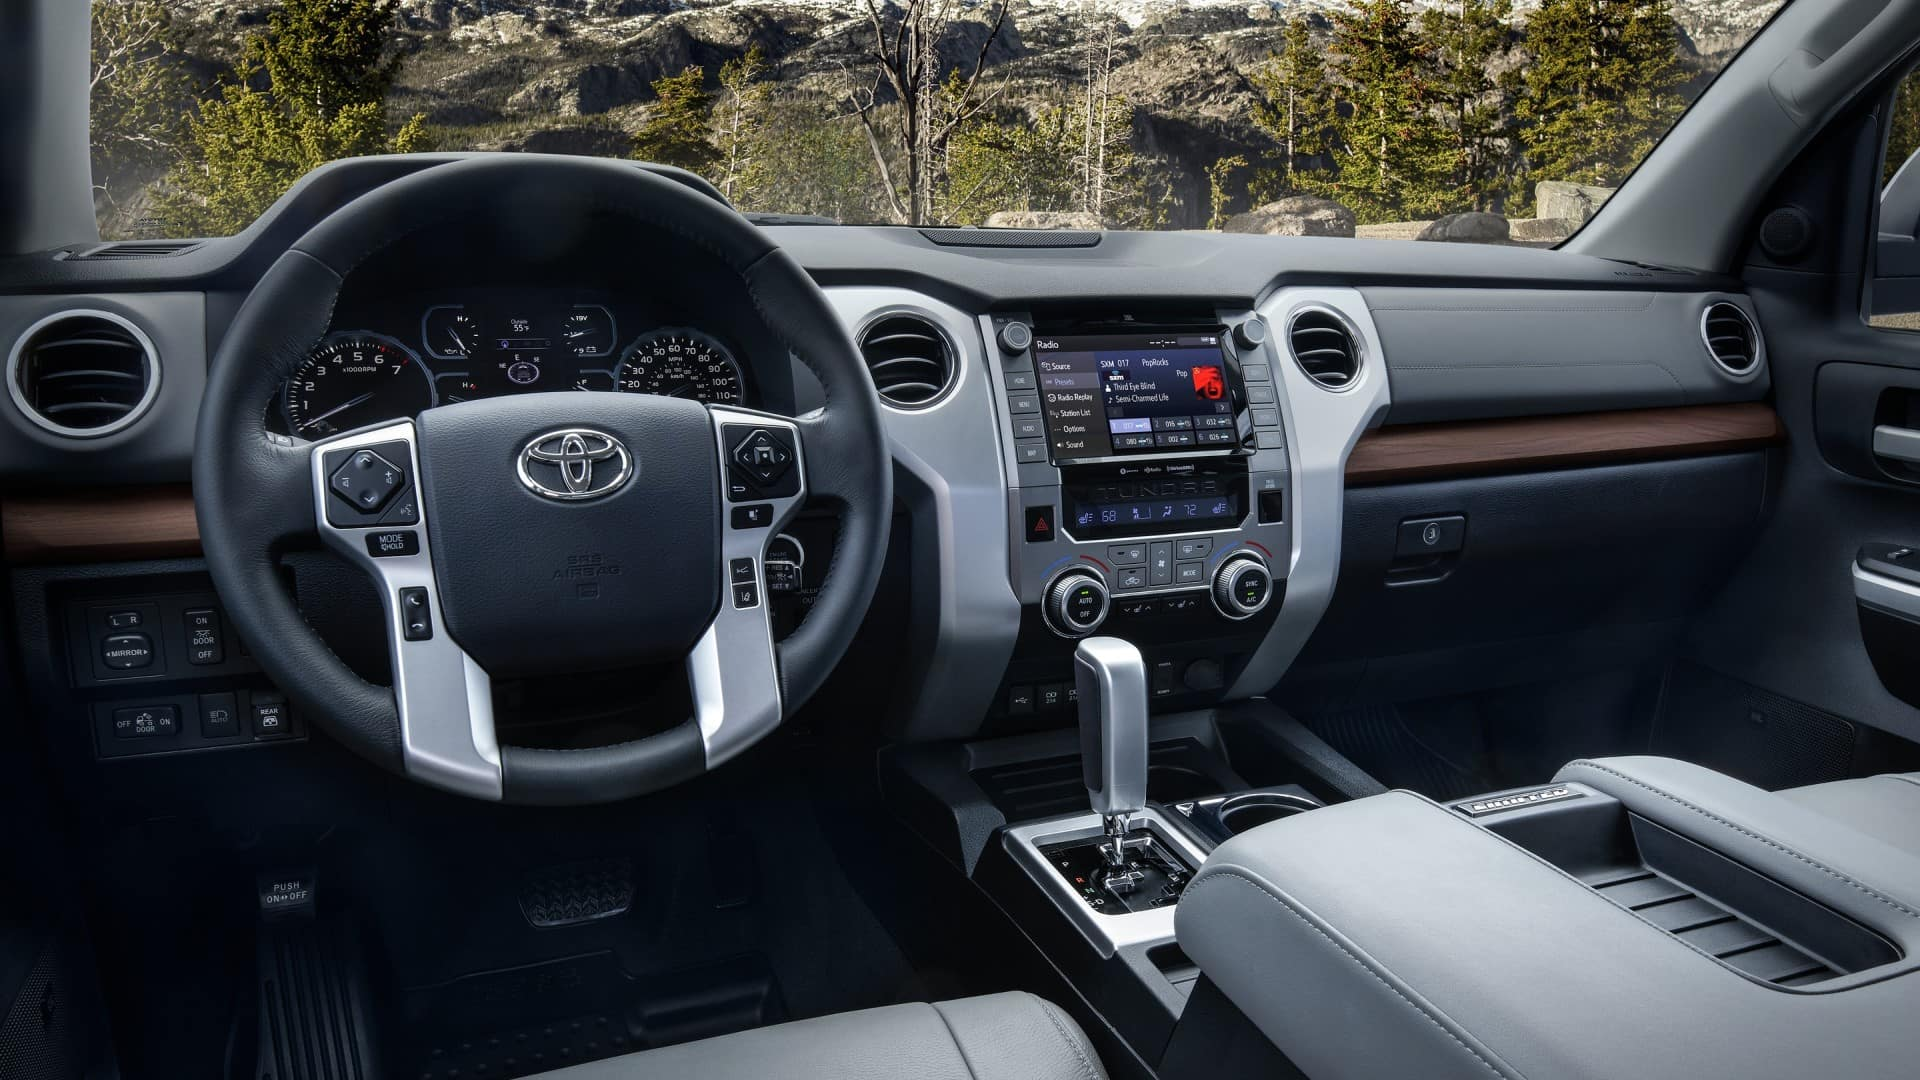 Toyota_Tundra_Interior_Dashboard